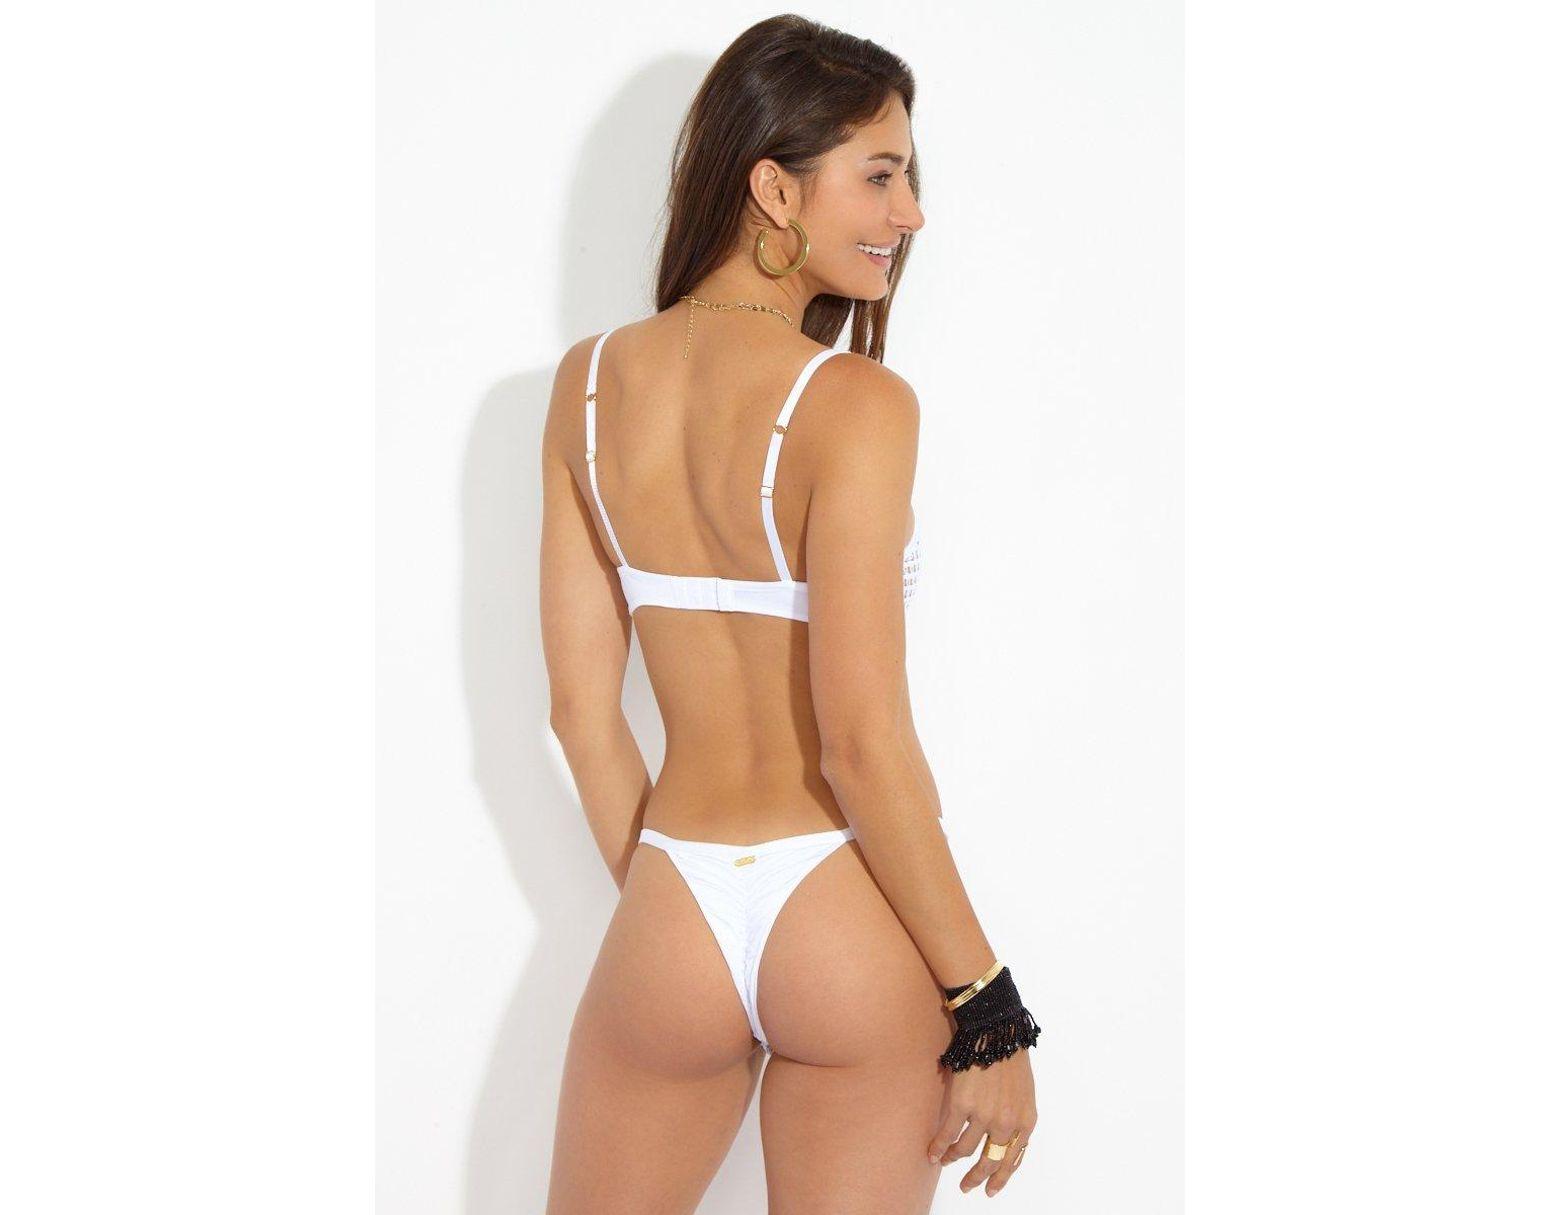 4efd6d09b0 Beach Bunny Ava Tango Mesh Thong Bikini Bottom - White in White - Lyst